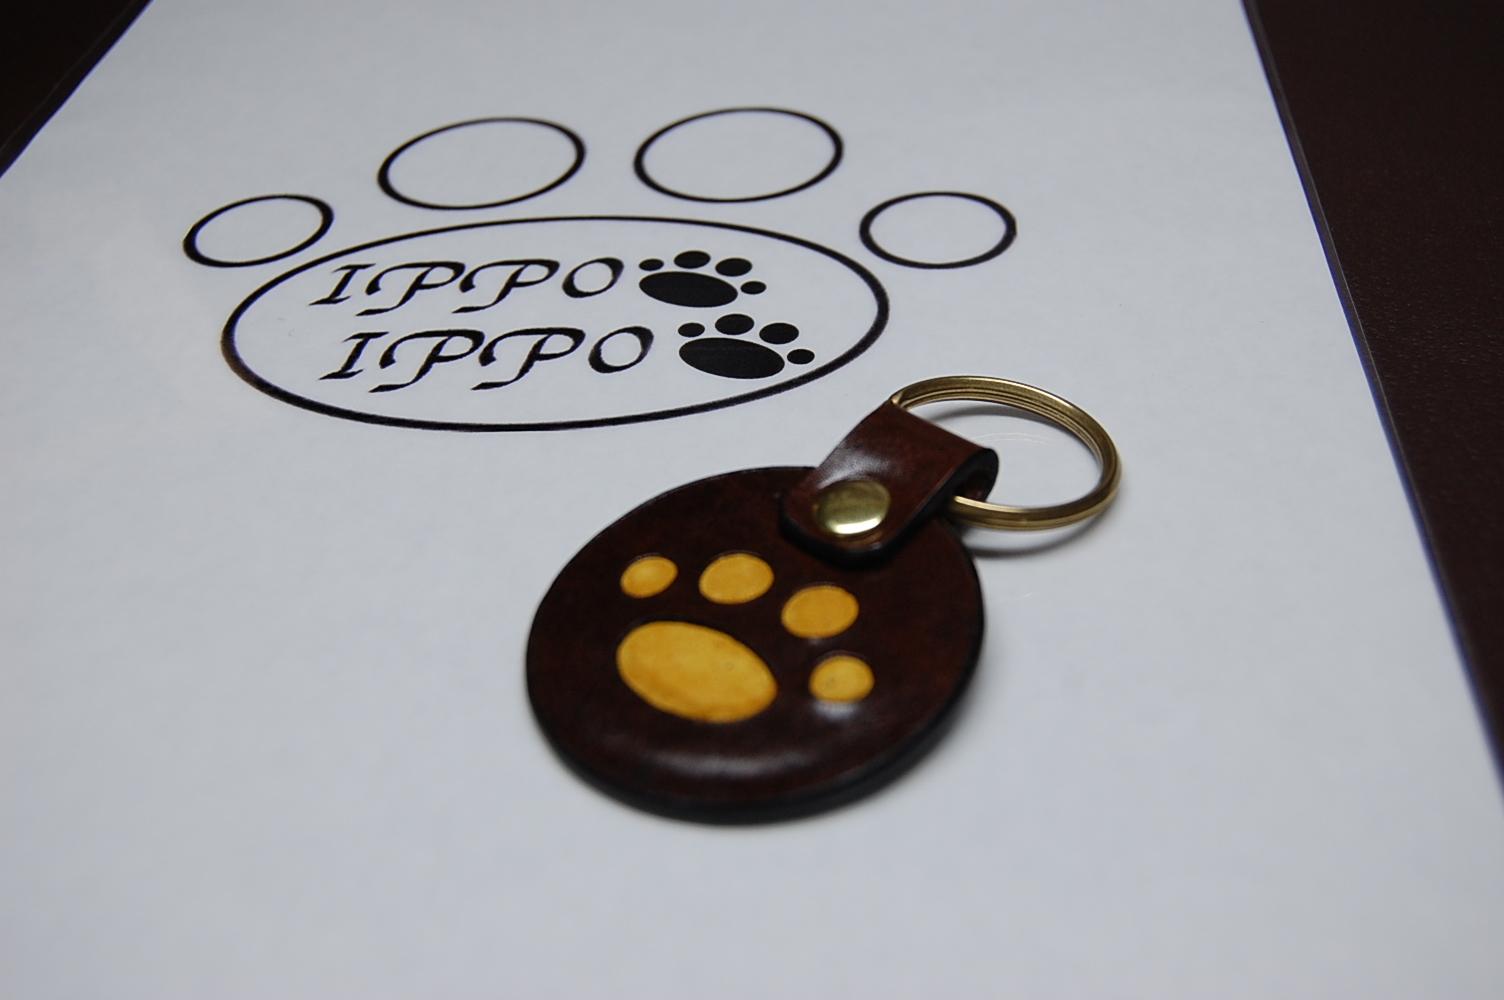 ippo(紺)